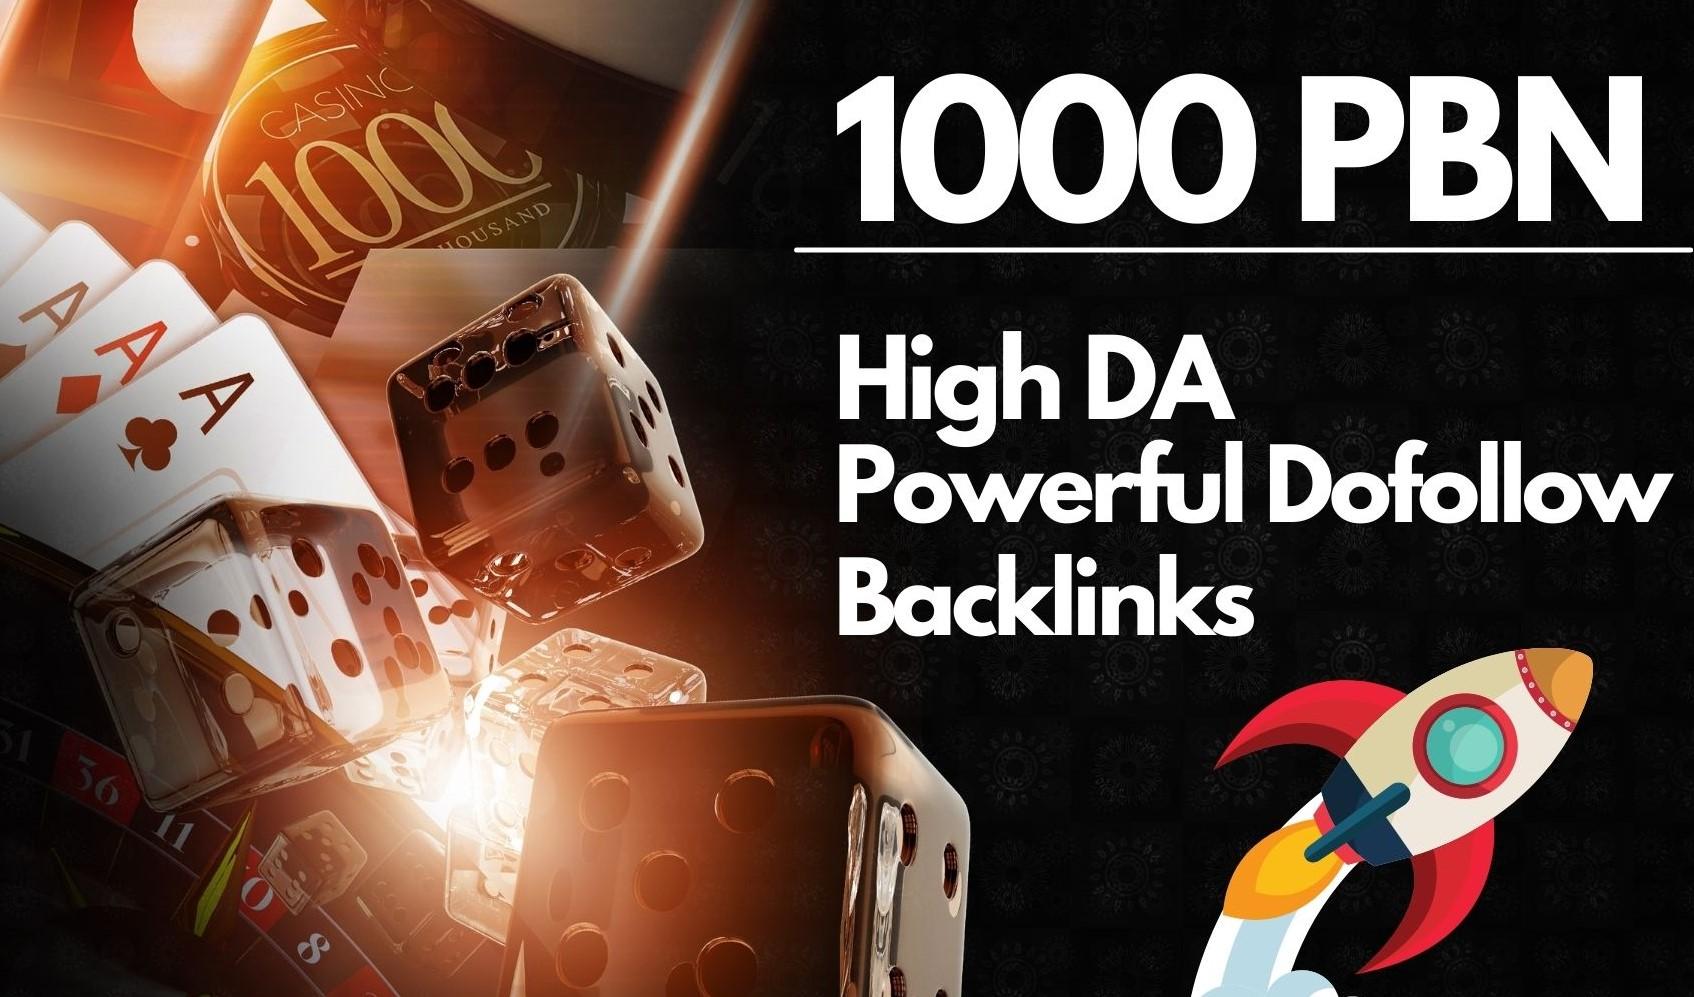 create 1000 PBN high da powerful dofollow backlinks for Casino/Gambling/Poker